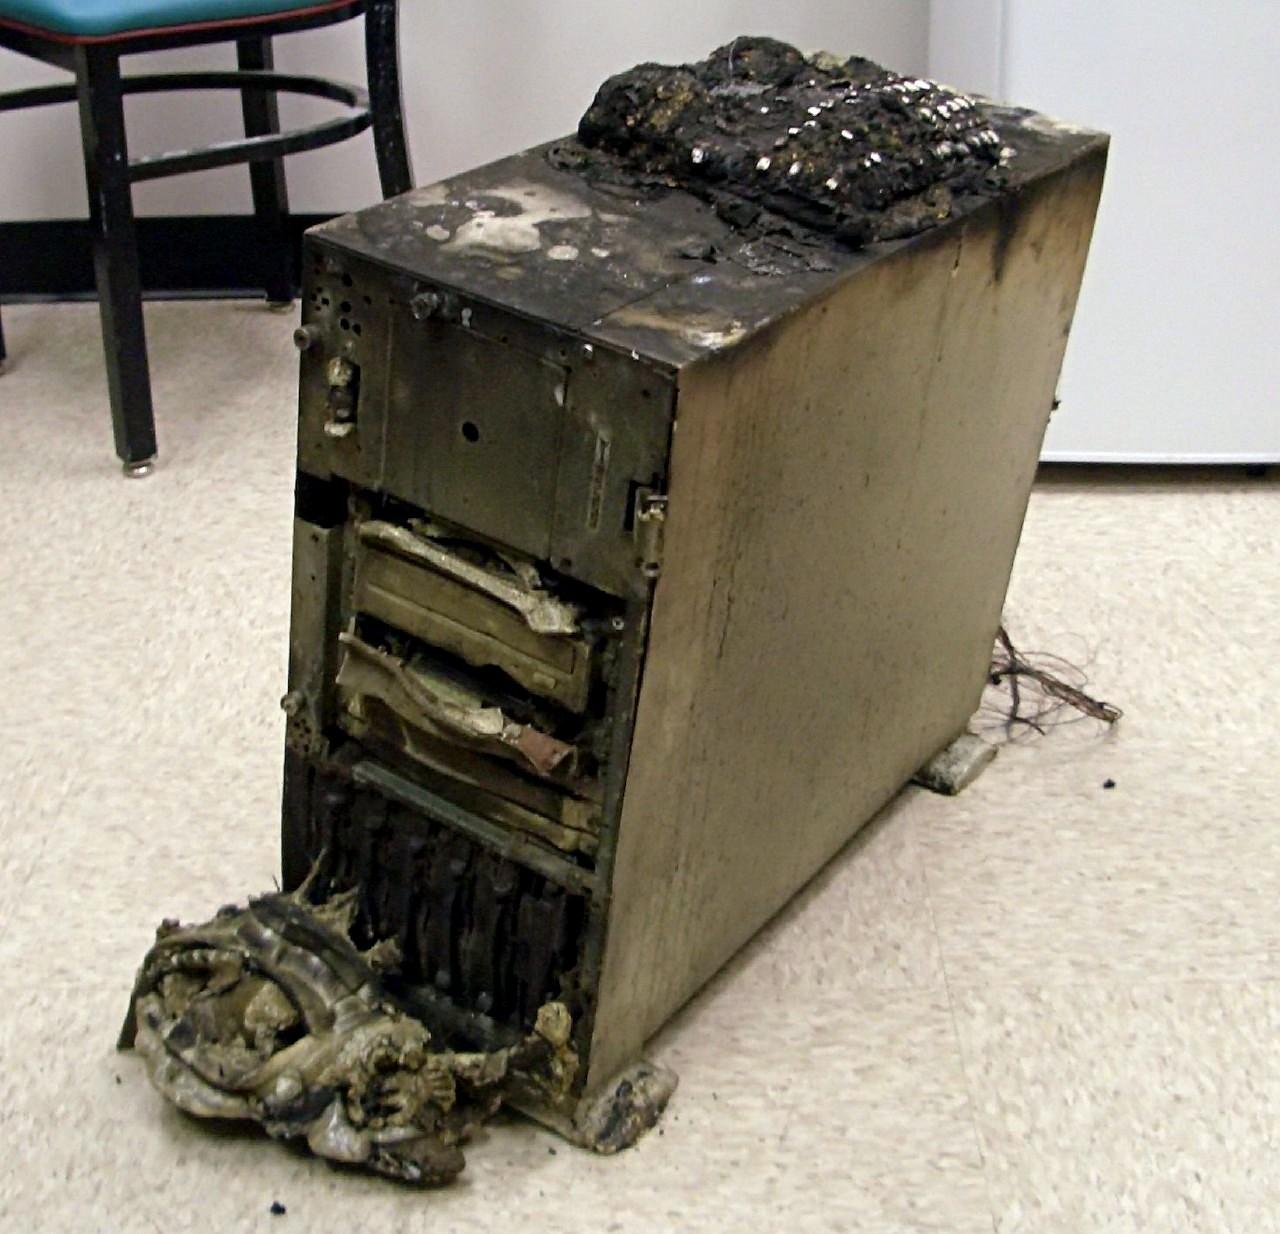 sudegęs serveris